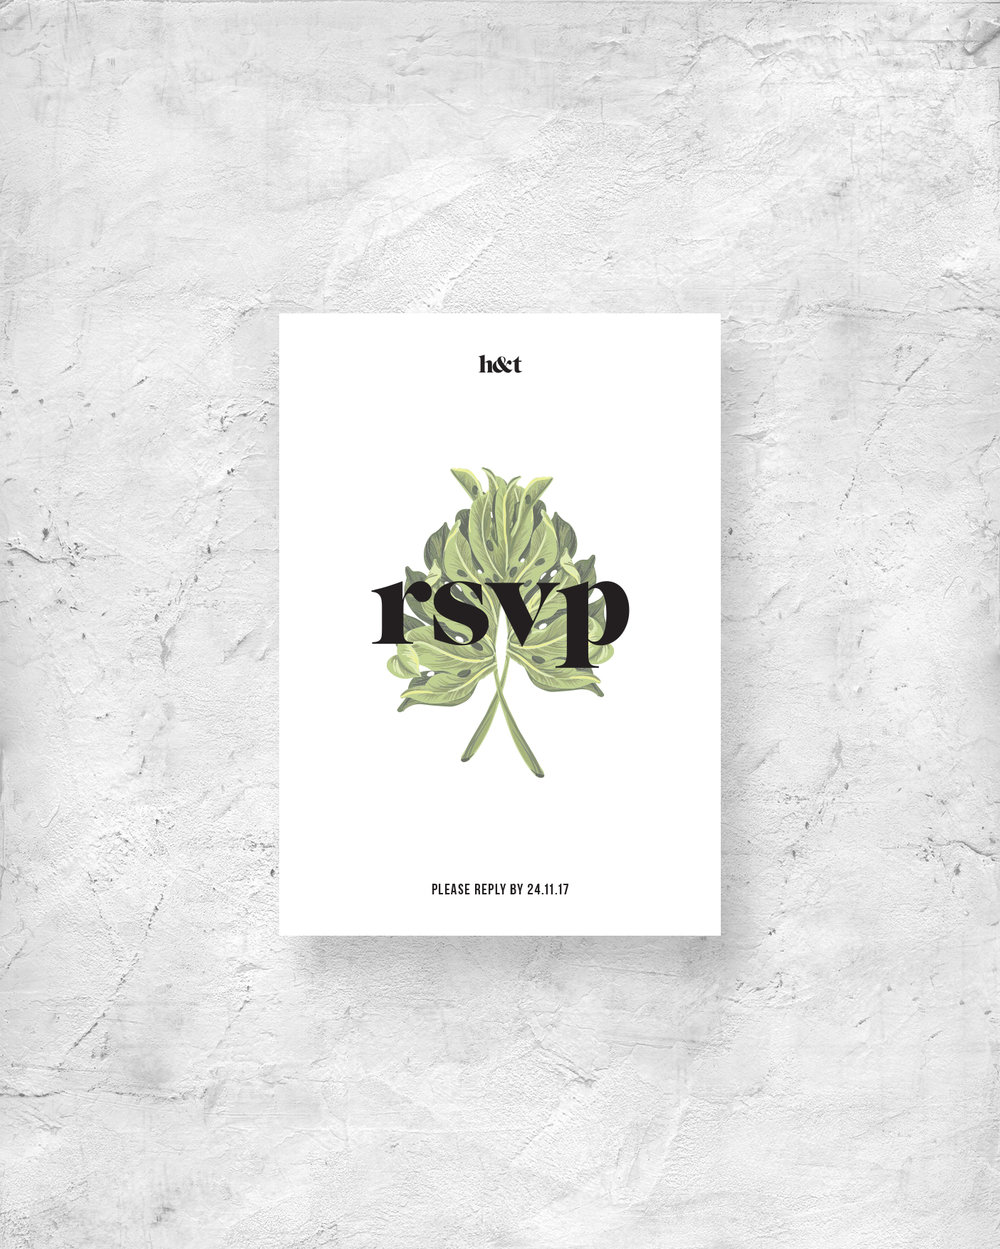 RSVP Card II - Front